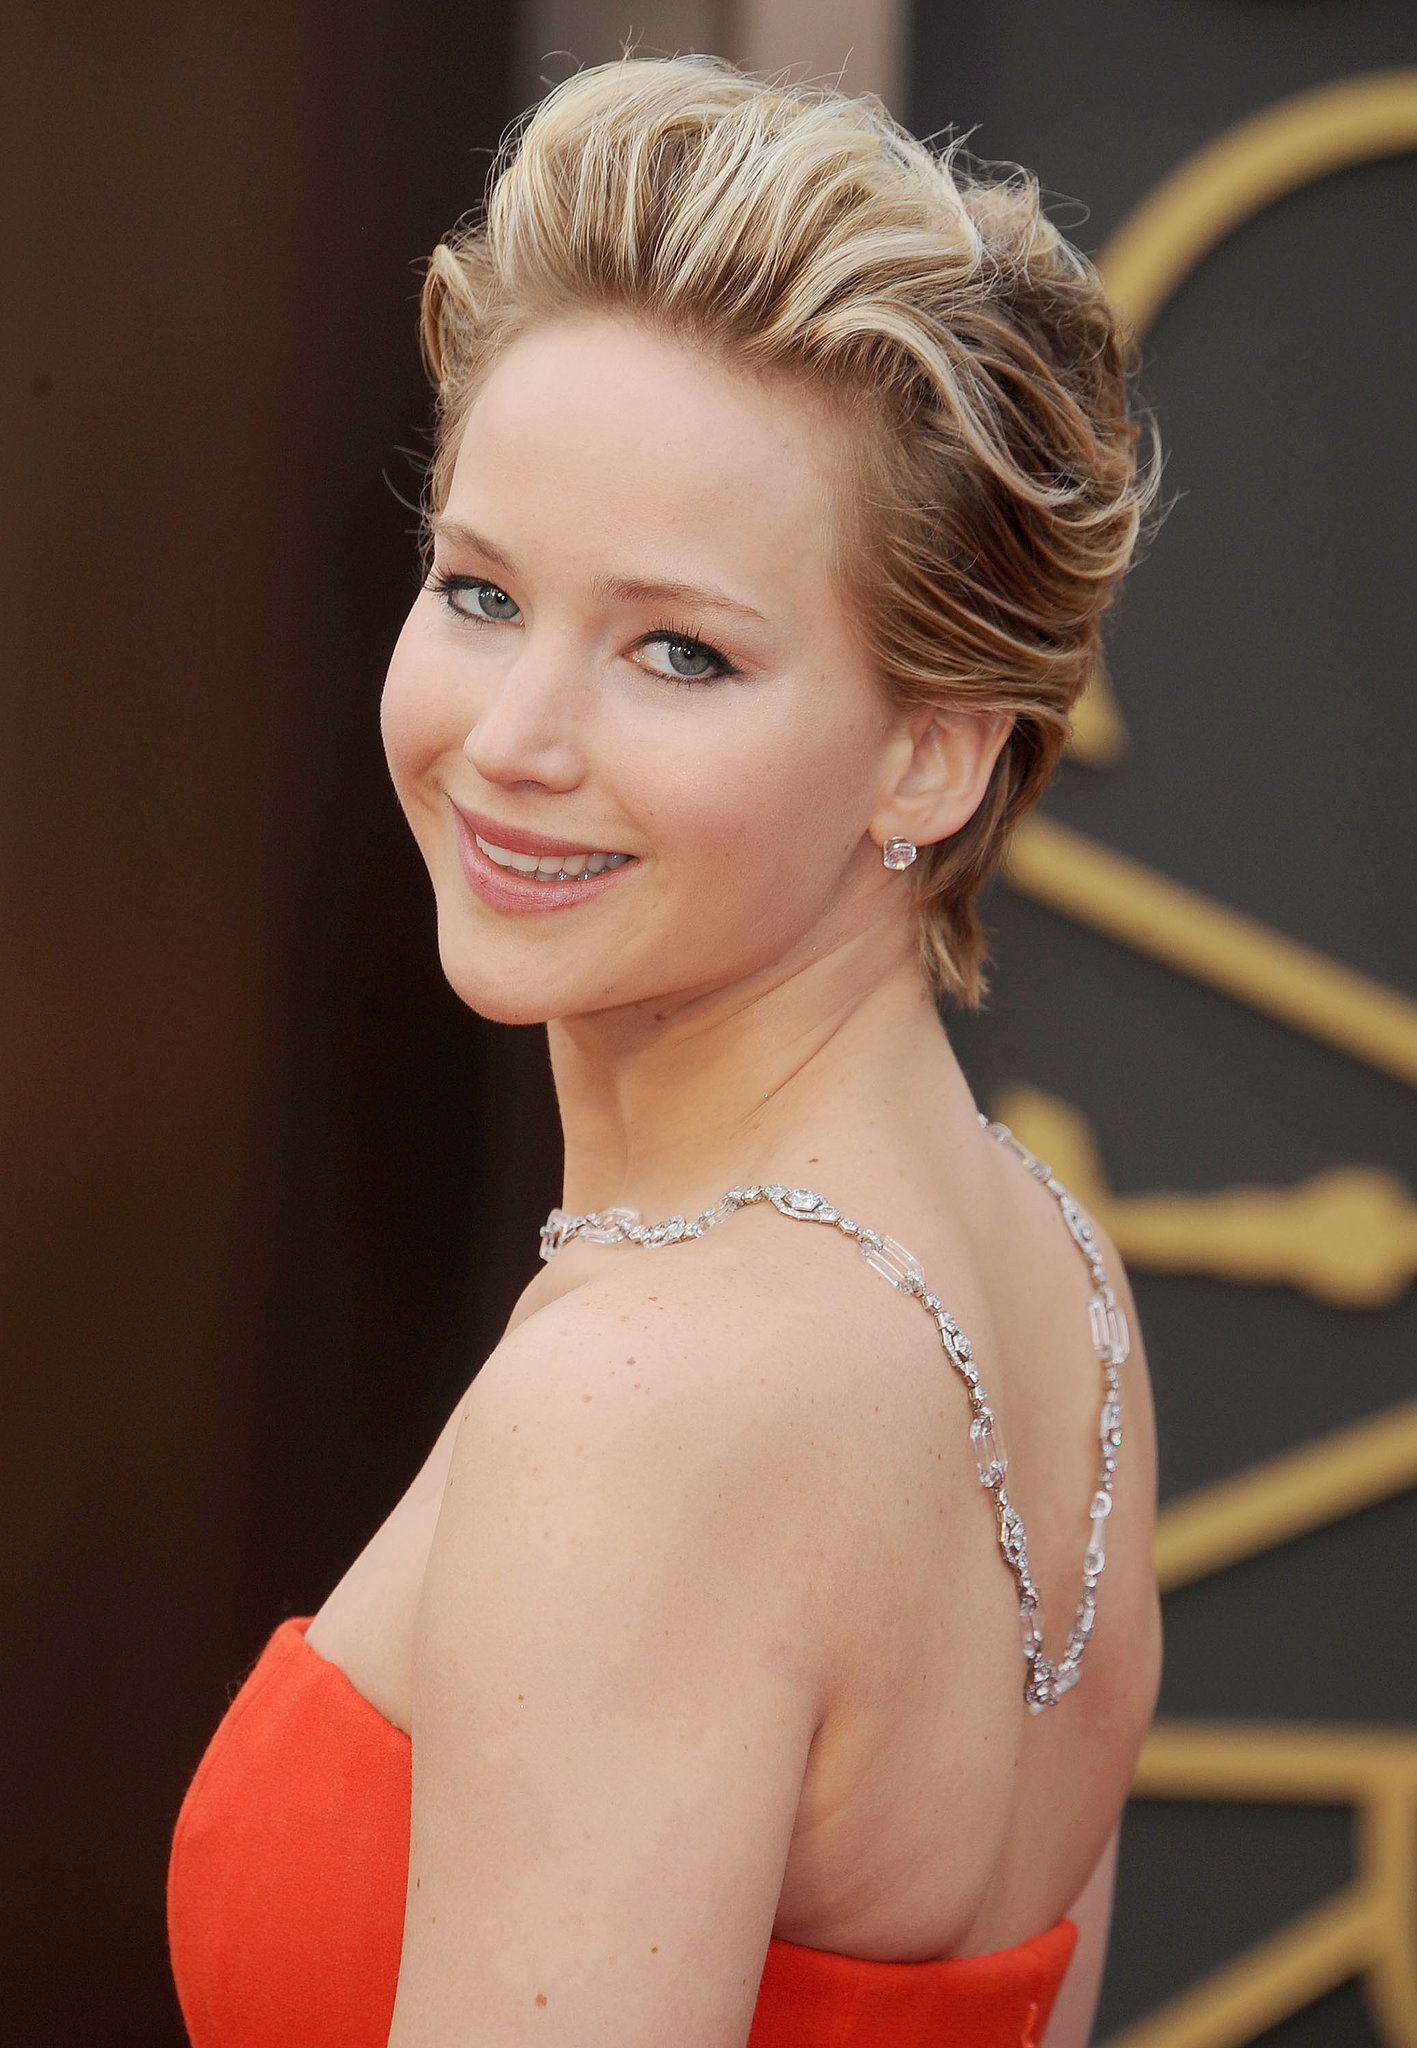 Jennifer Lawrence's Grown-Out Pixie